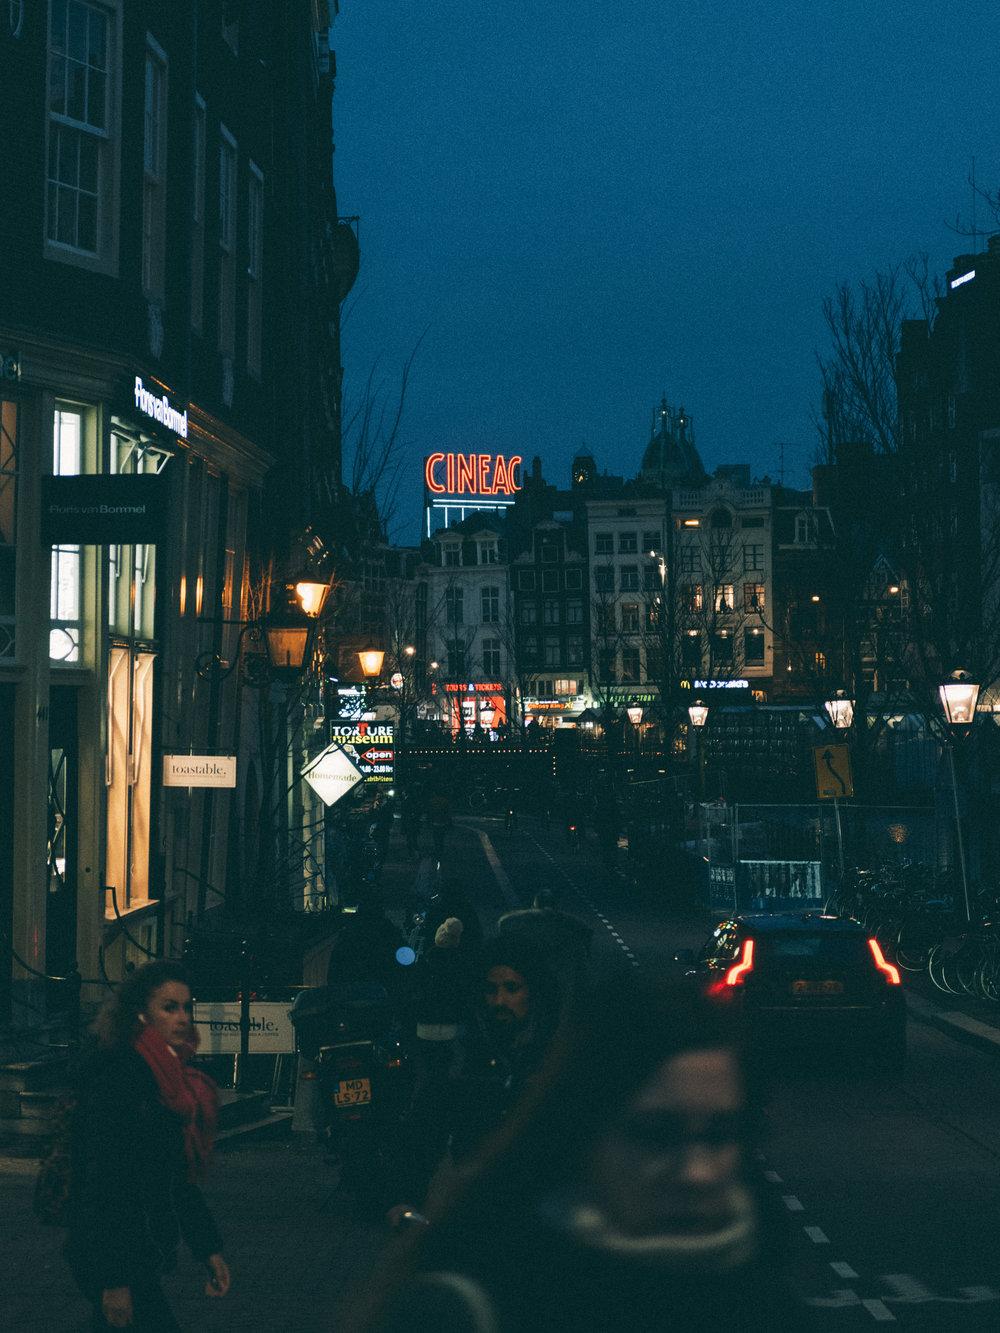 cineac-amsterdam-night-street-photography